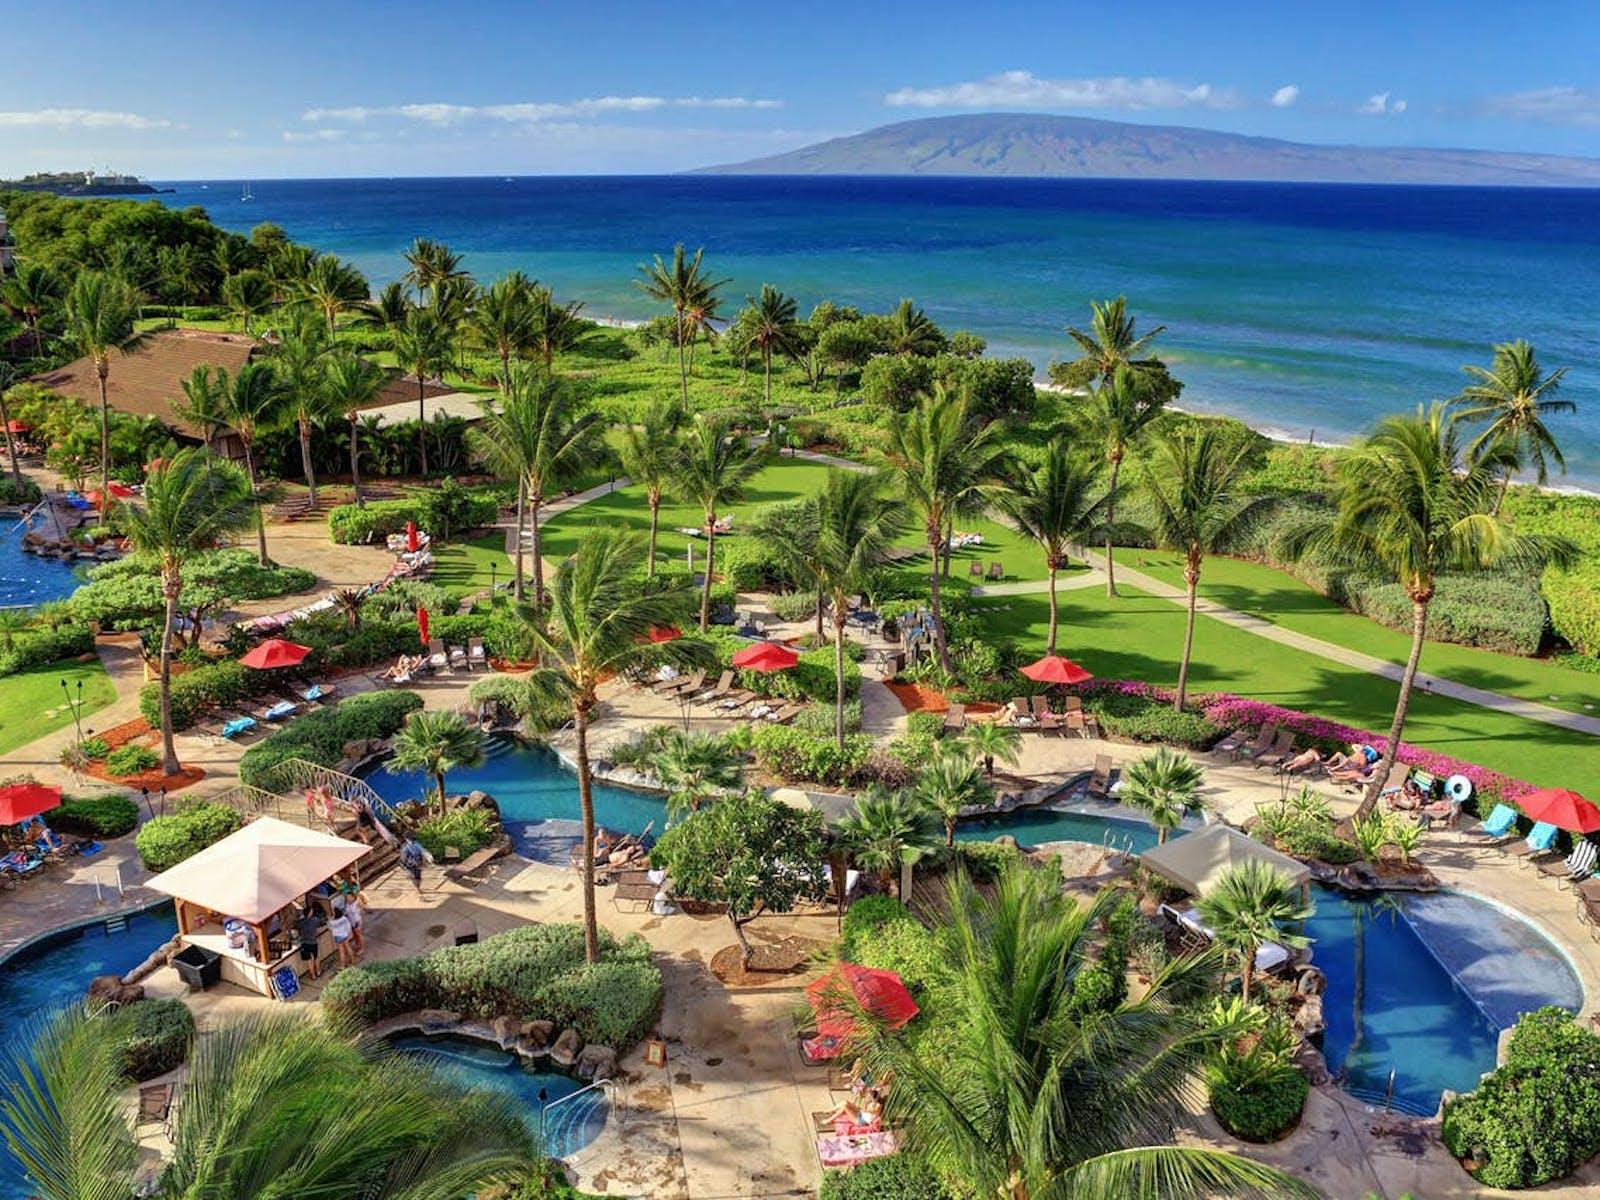 Honua Kai Resort on Maui, Hawaii